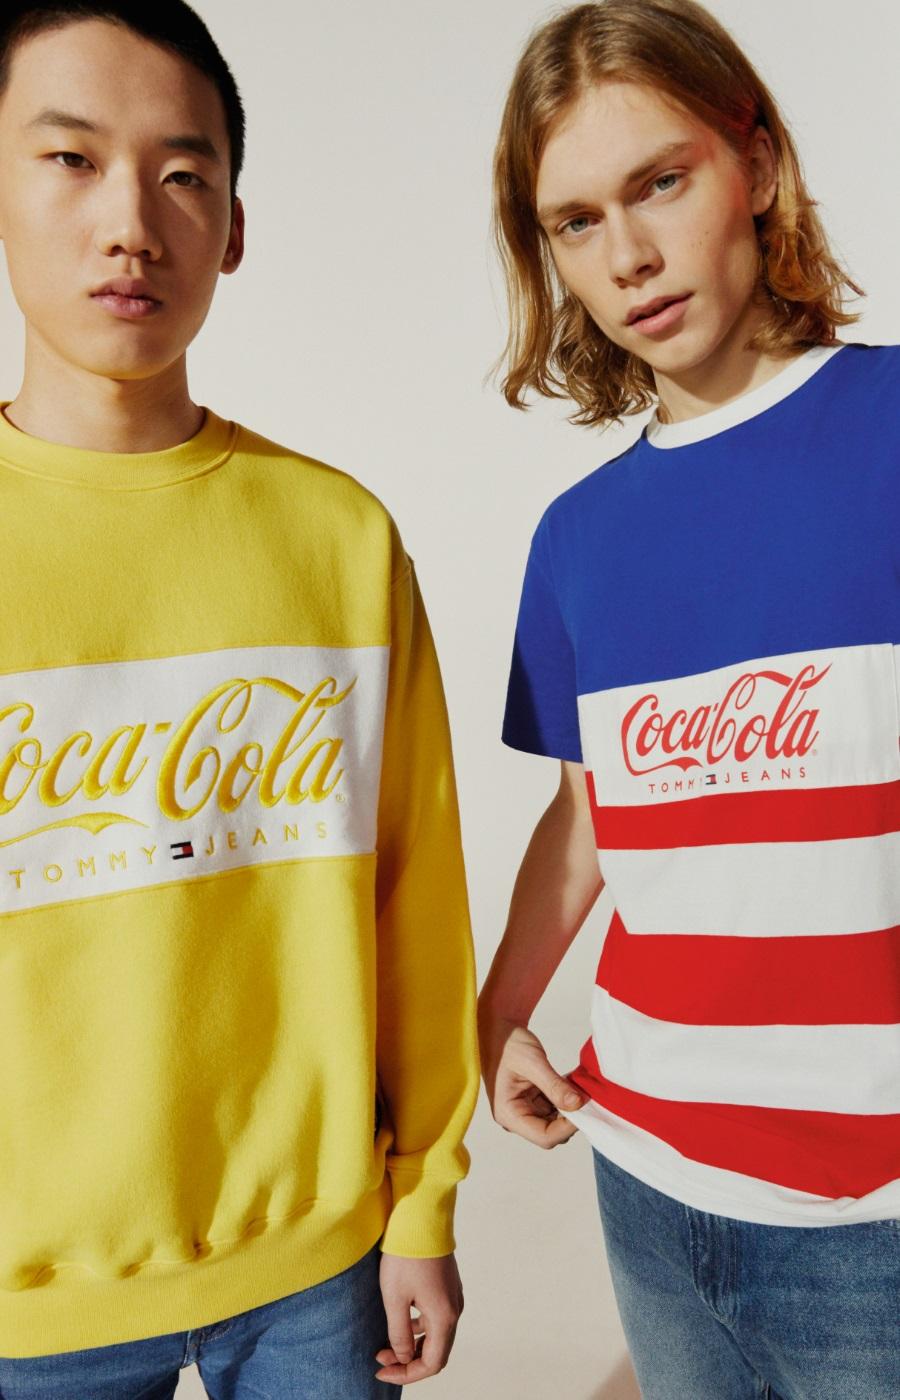 tommy-hilfiger-coca-cola-1